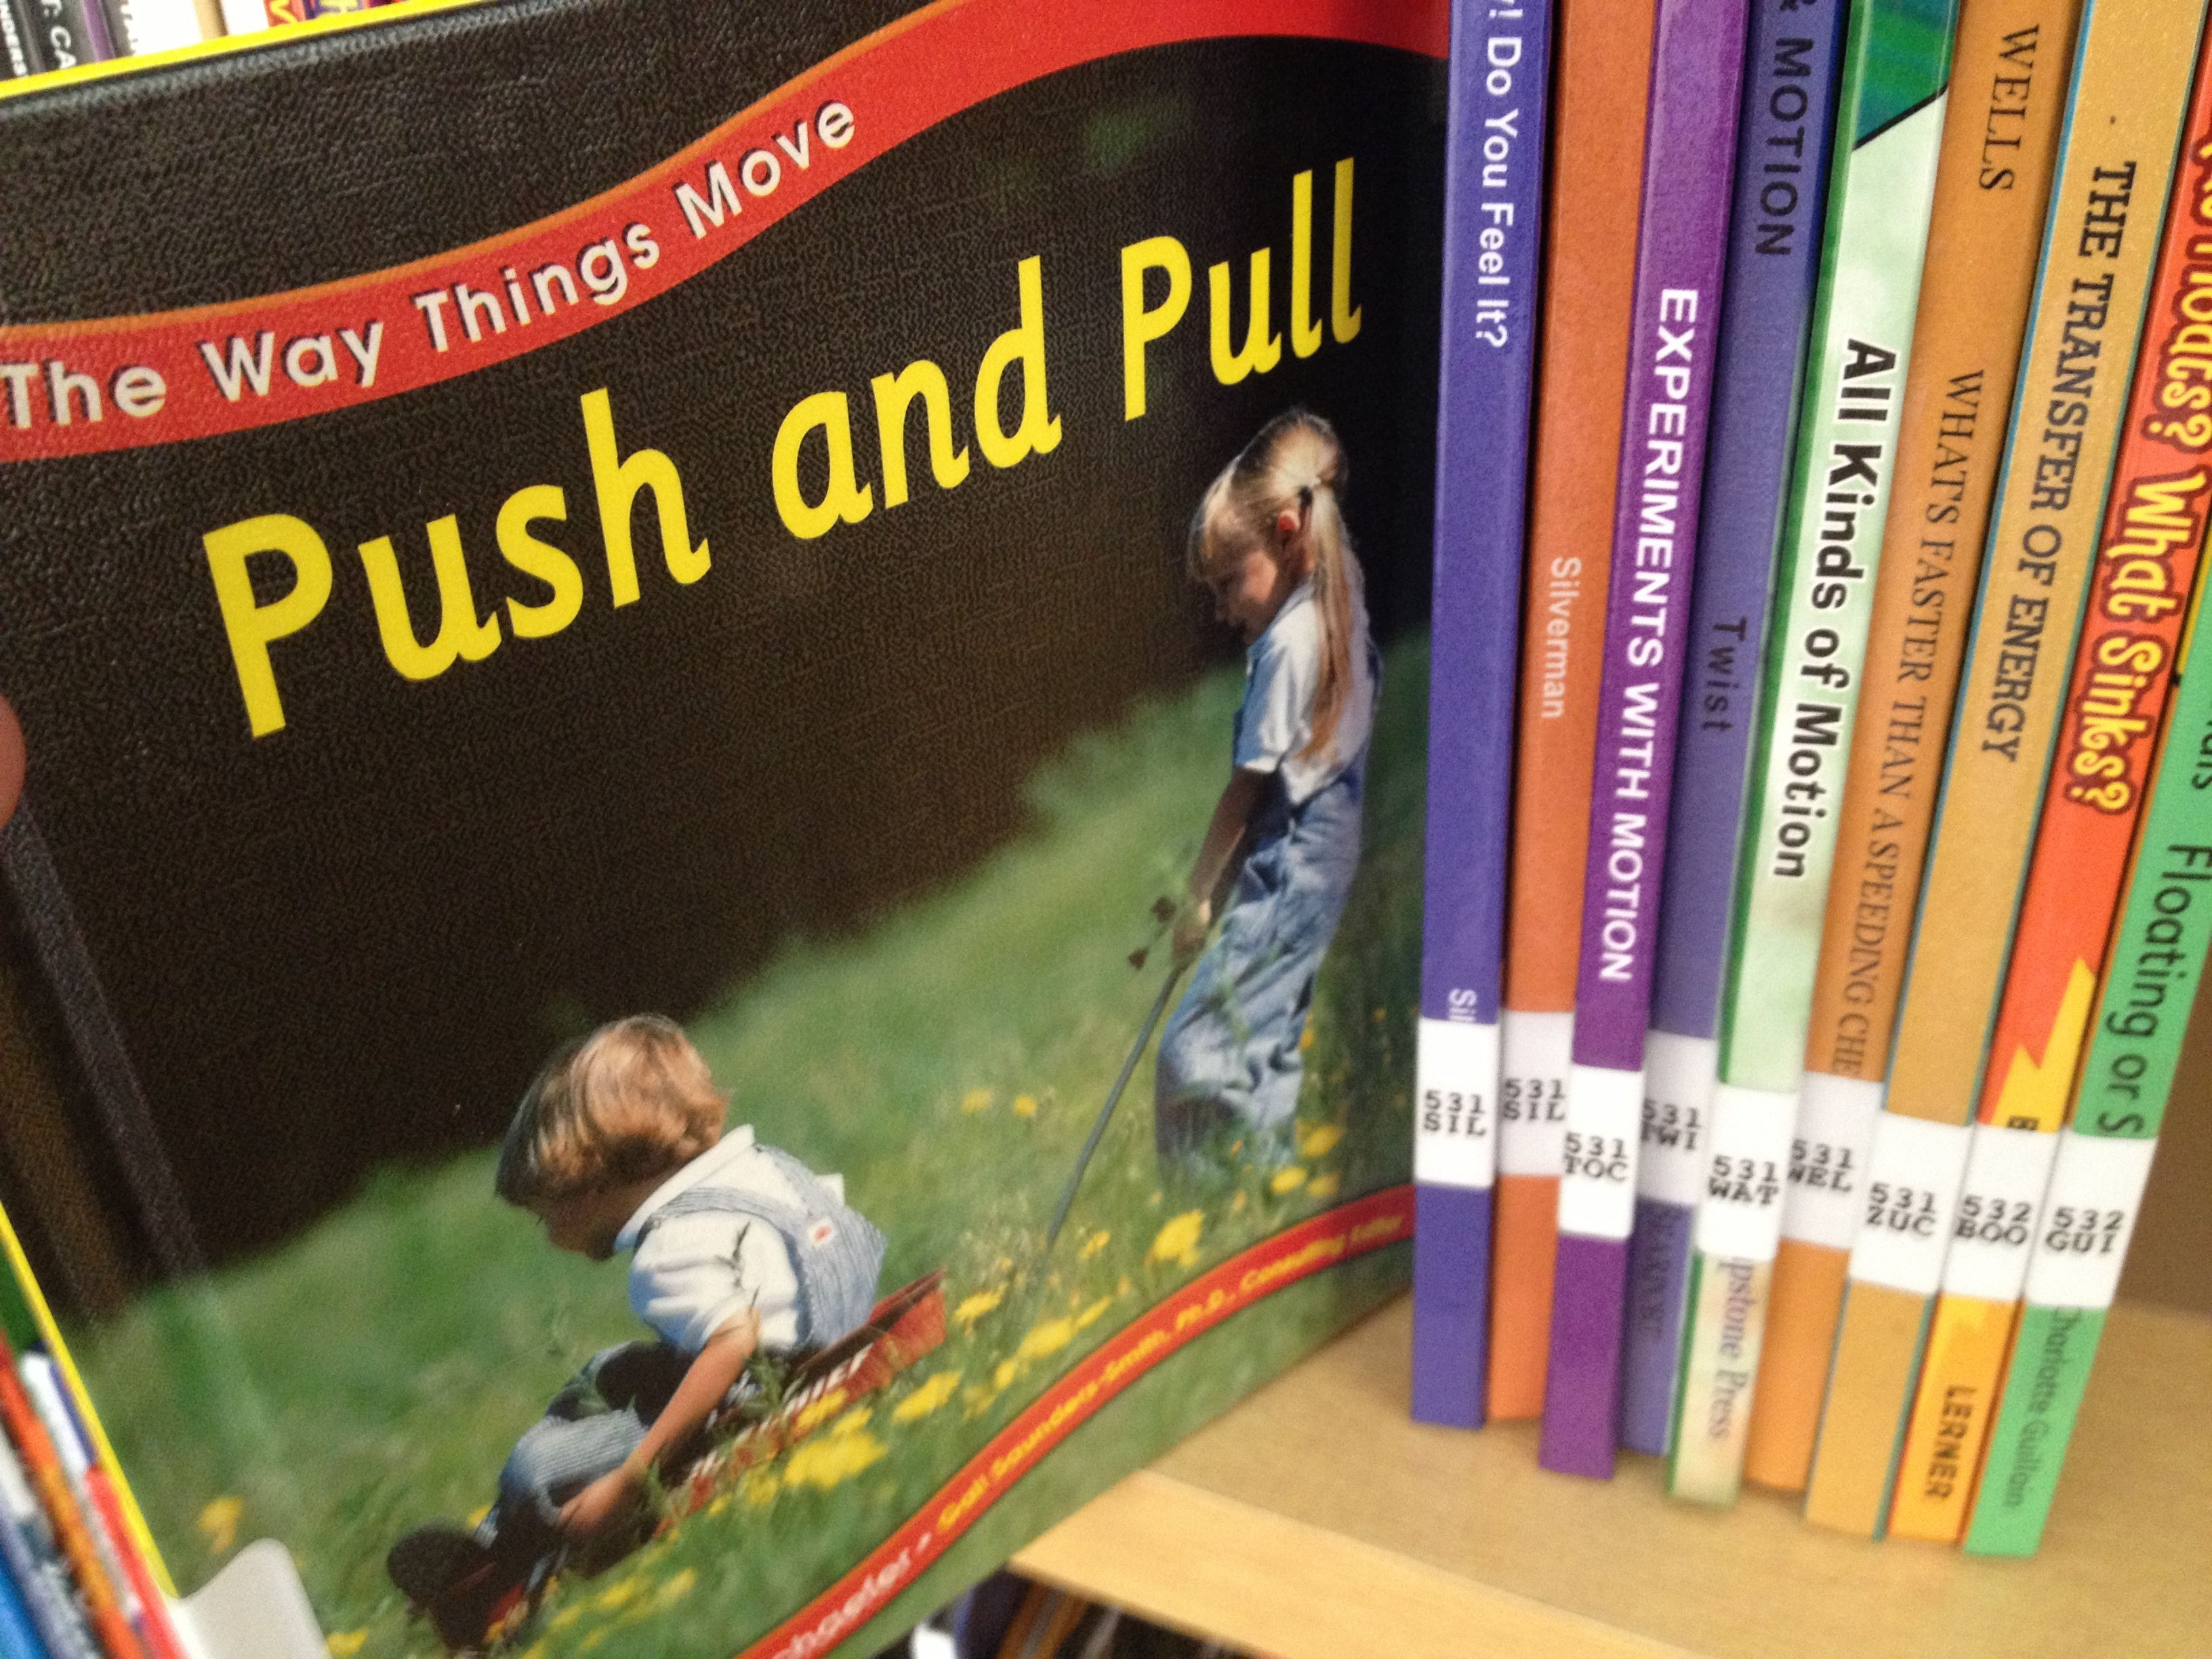 Push And Pull Books